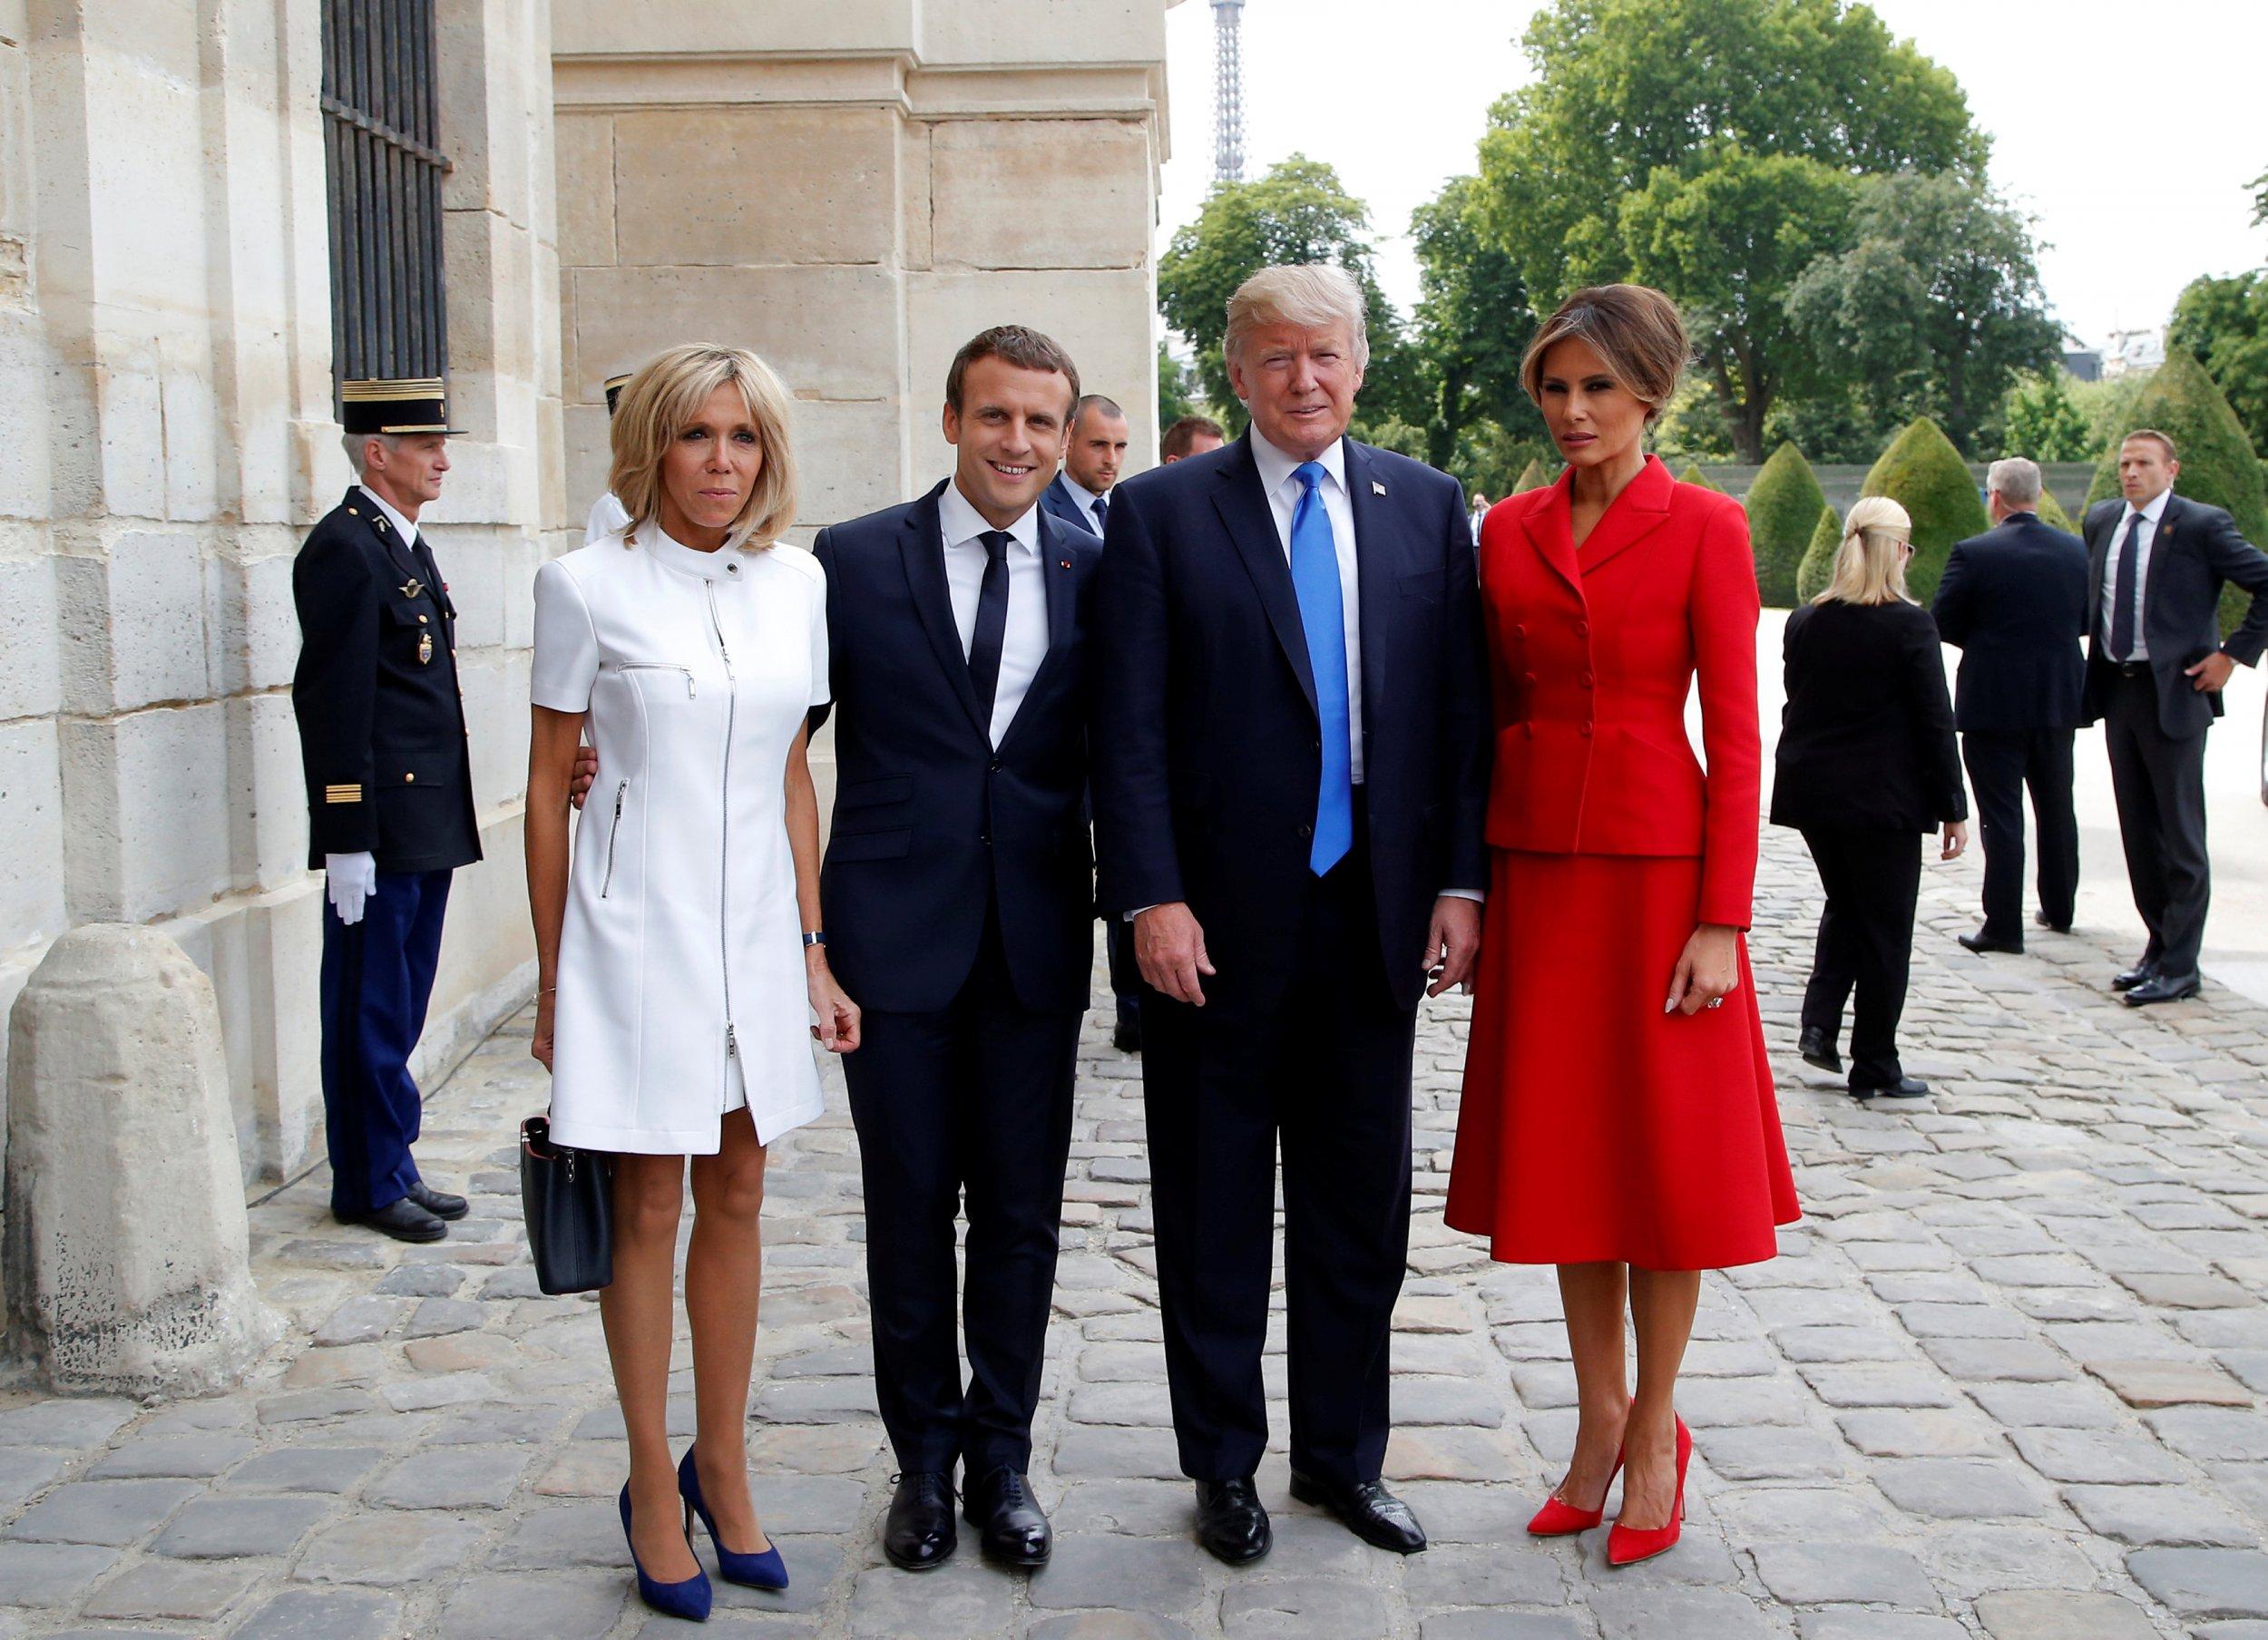 Brigitte, Emmanuel Macron, Donald, Melania Trump